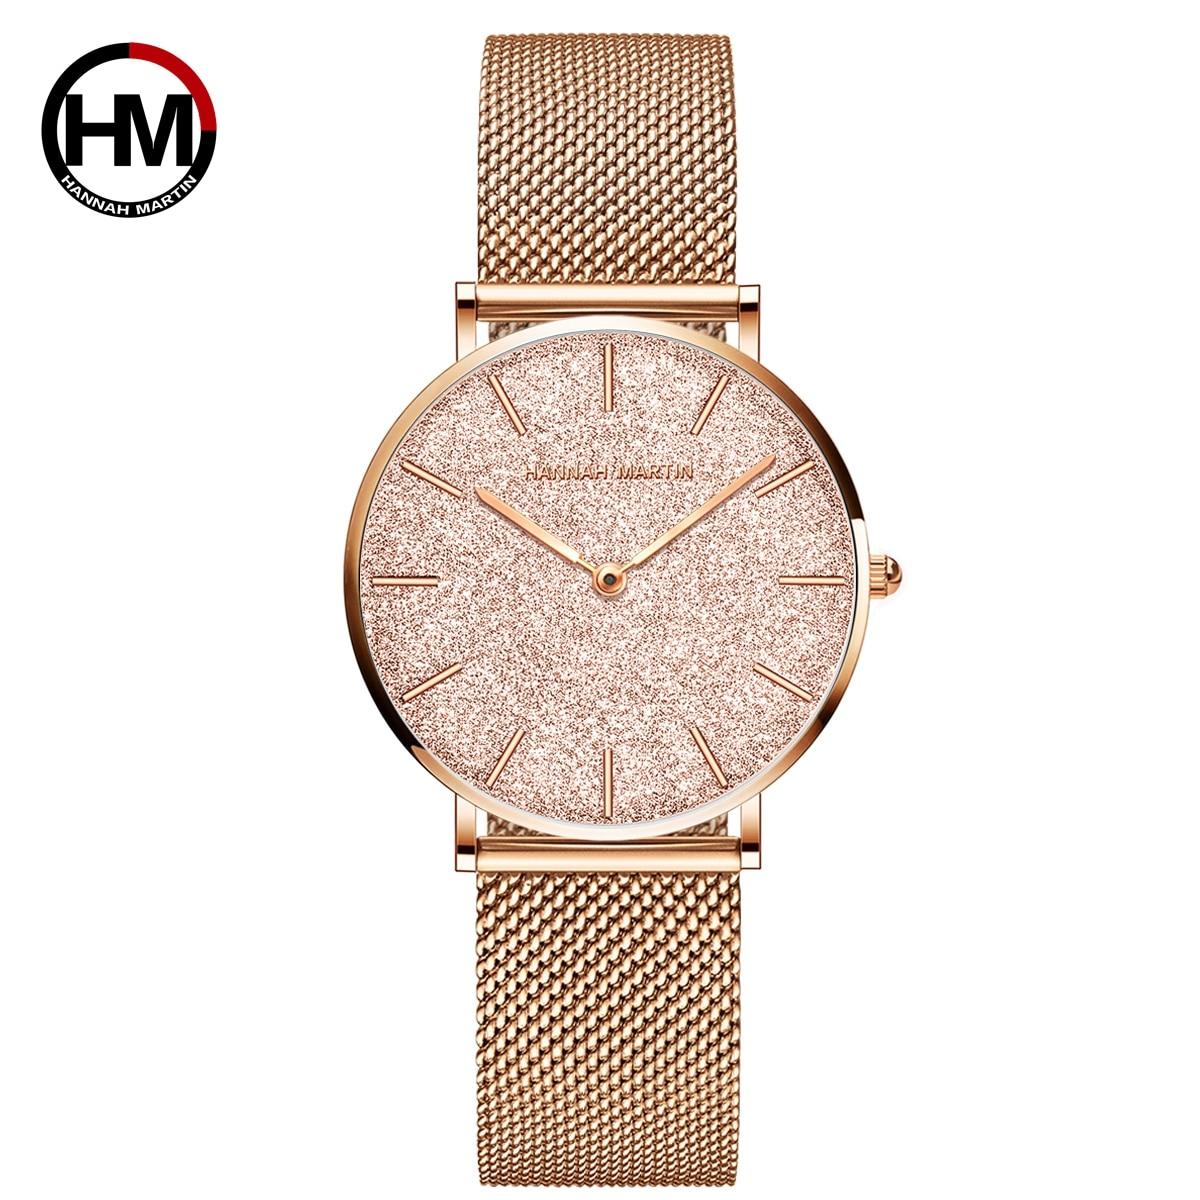 Sahara Desert Dial New Design 2021 Top Brand Luxury Japan Quartz Wristwatch Stainless Steel Rose Gold Waterproof Watch for Women enlarge